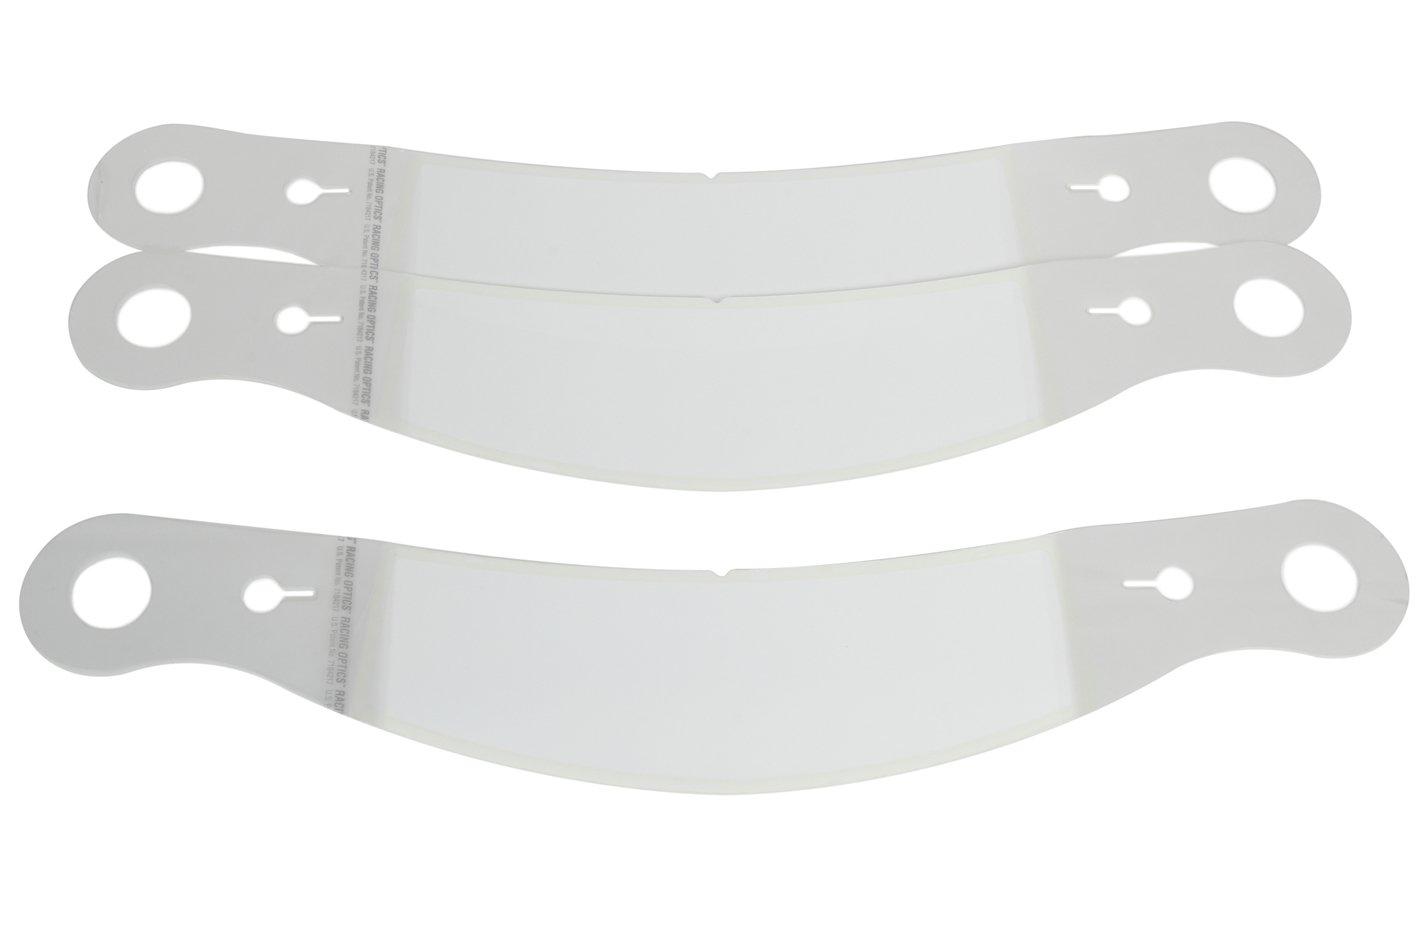 Perimeter Tearoff Bell SE03 And SE05 Shields